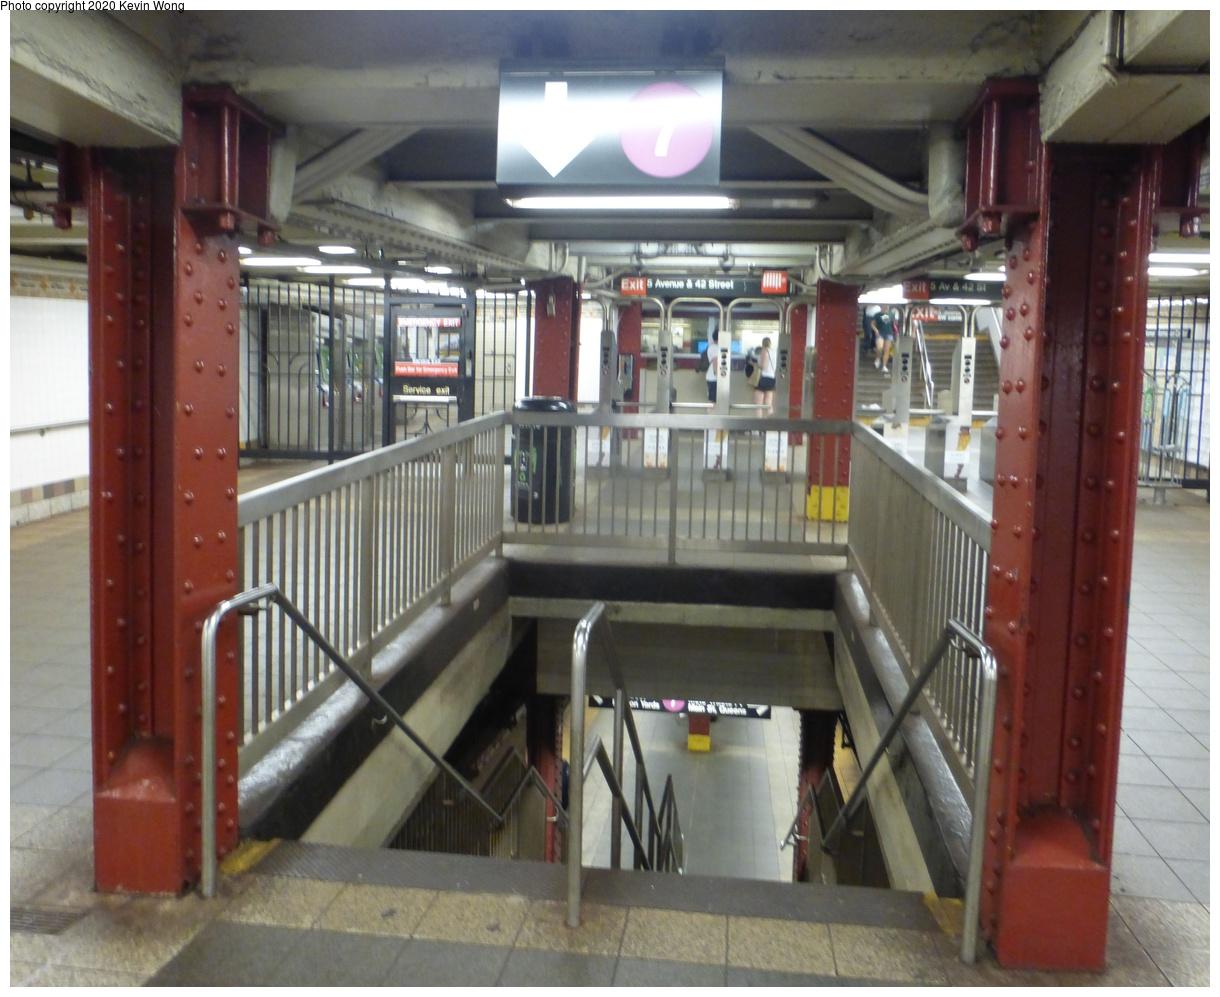 (395k, 1220x997)<br><b>Country:</b> United States<br><b>City:</b> New York<br><b>System:</b> New York City Transit<br><b>Line:</b> IRT Flushing Line<br><b>Location:</b> 5th Avenue<br><b>Photo by:</b> Kevin Wong<br><b>Date:</b> 7/1/2018<br><b>Viewed (this week/total):</b> 0 / 227